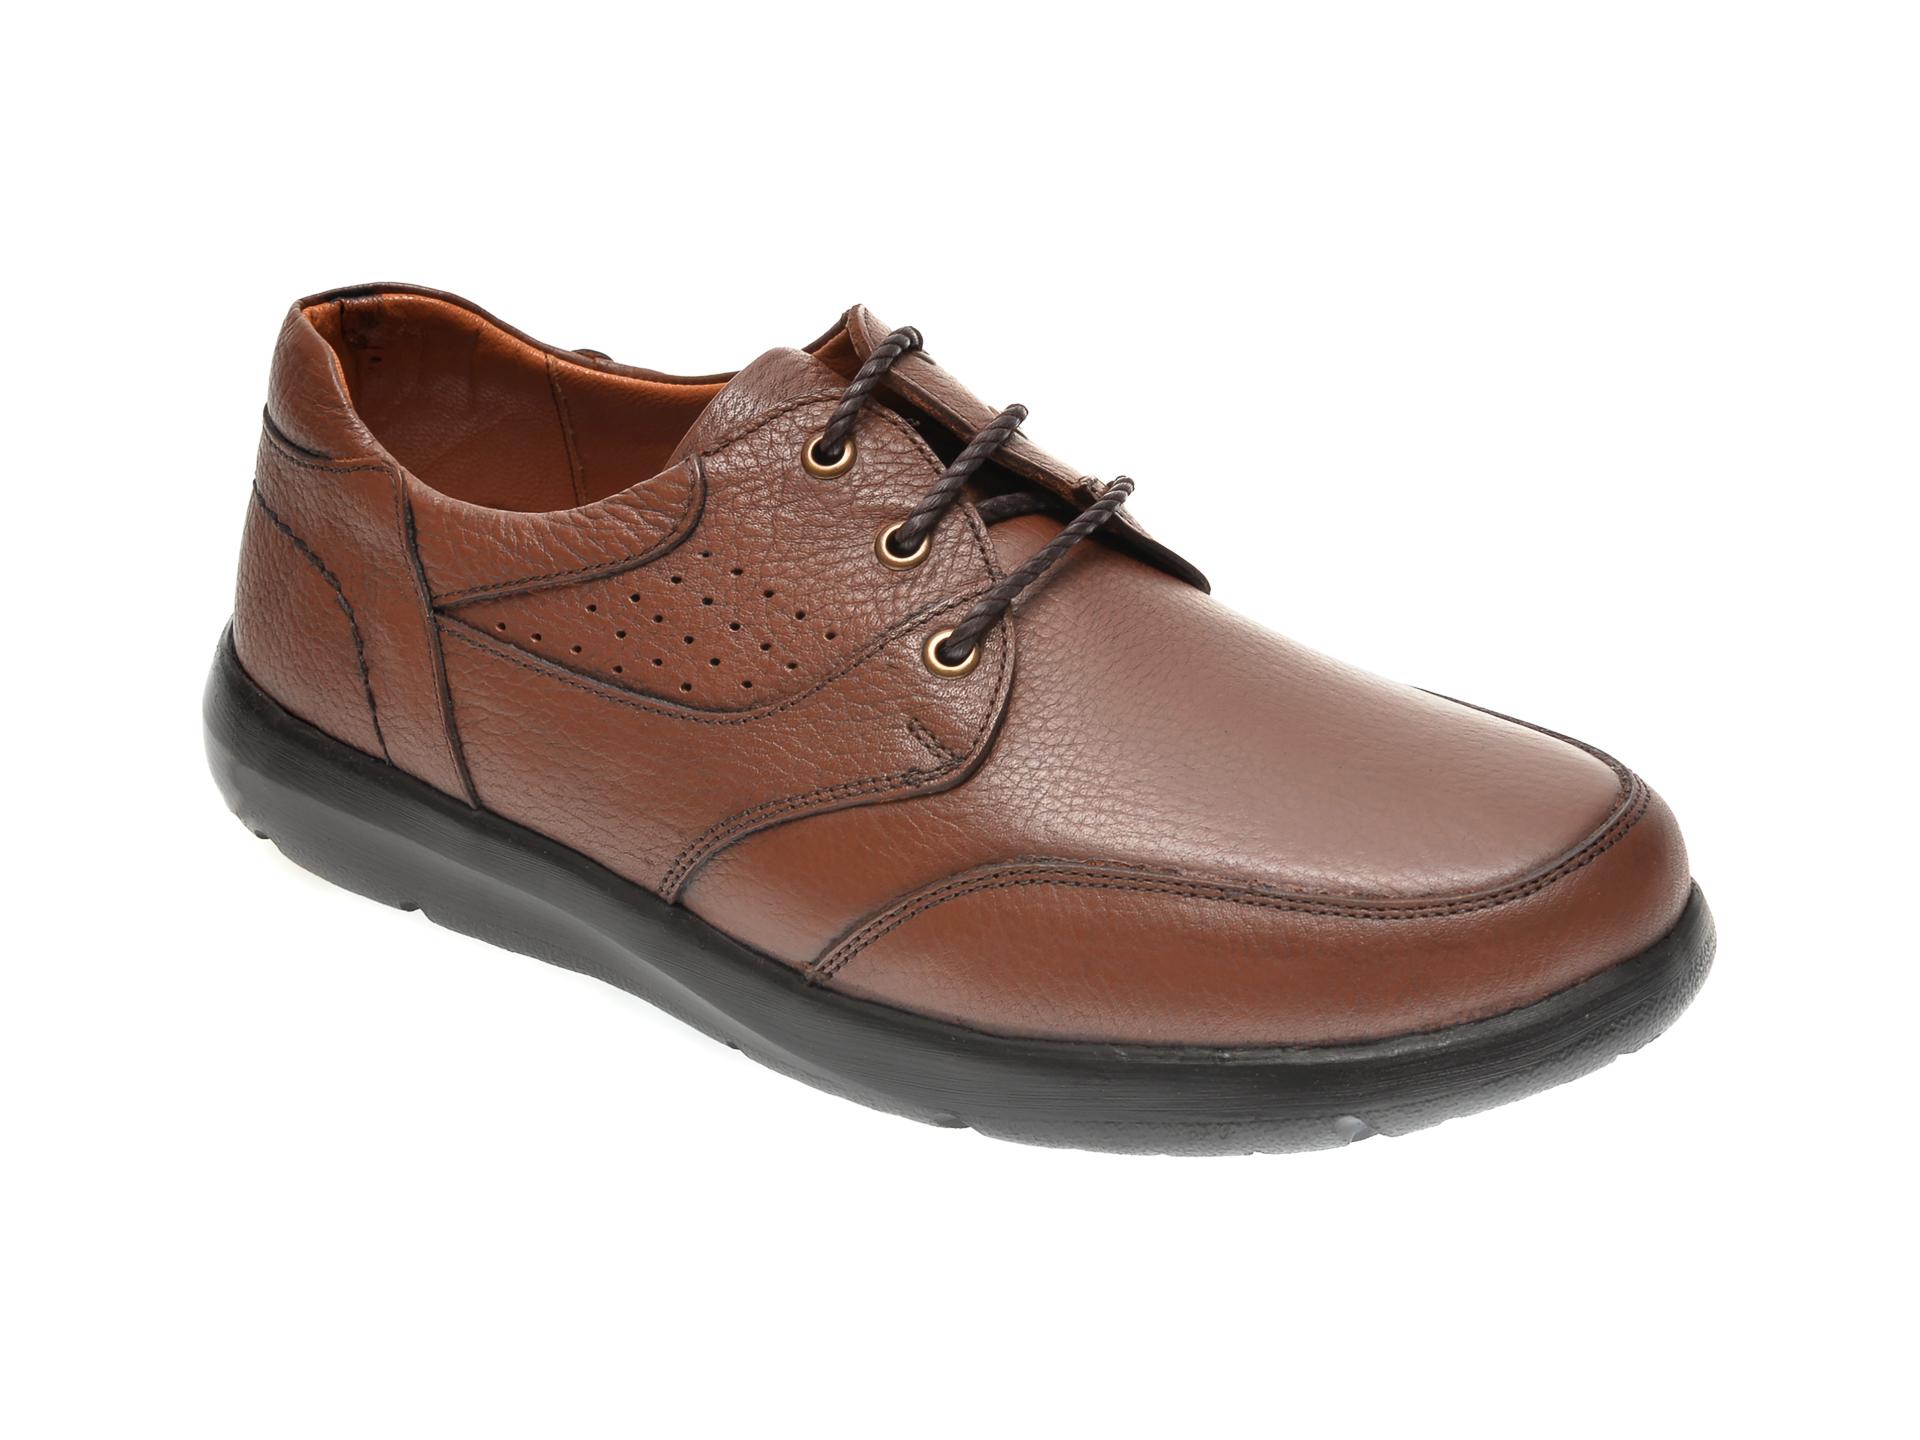 Pantofi Otter Maro, 20n905, Din Piele Naturala